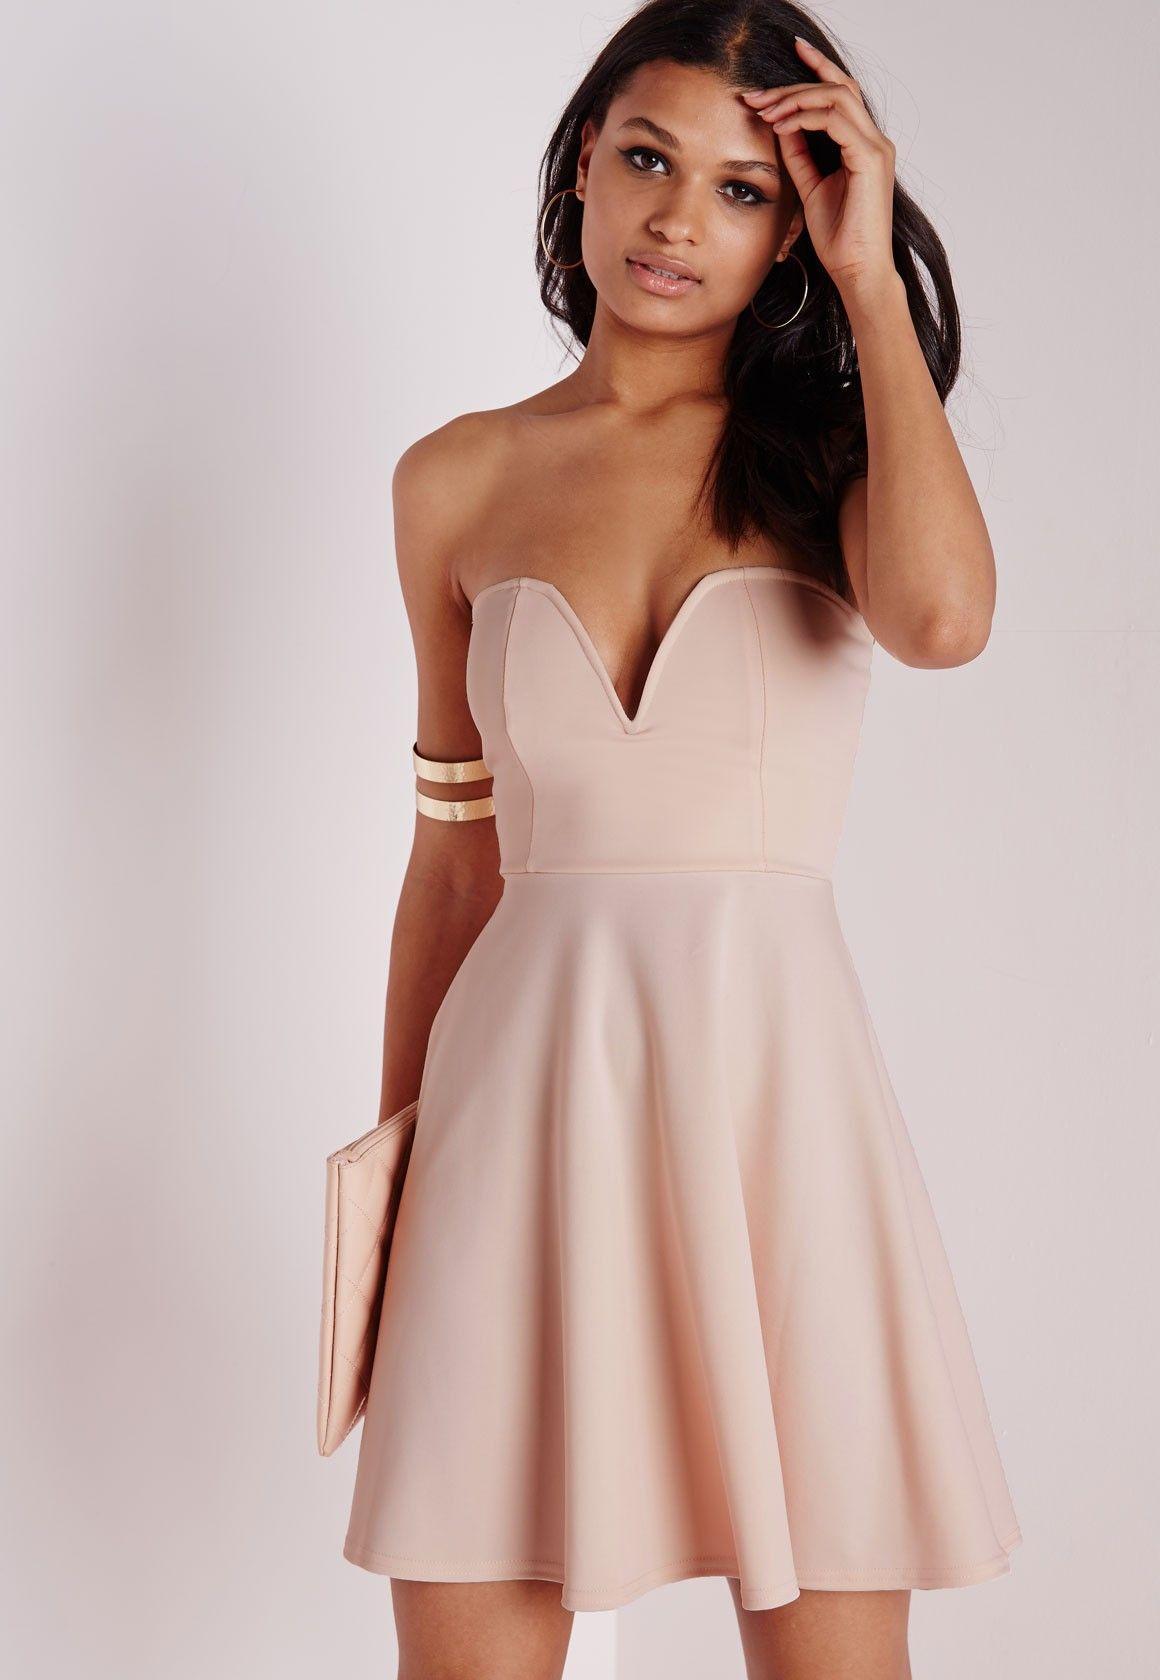 ff1471df5dea Scuba Plunge Skater Dress Nudes - Dresses - Skater Dresses - Missguided